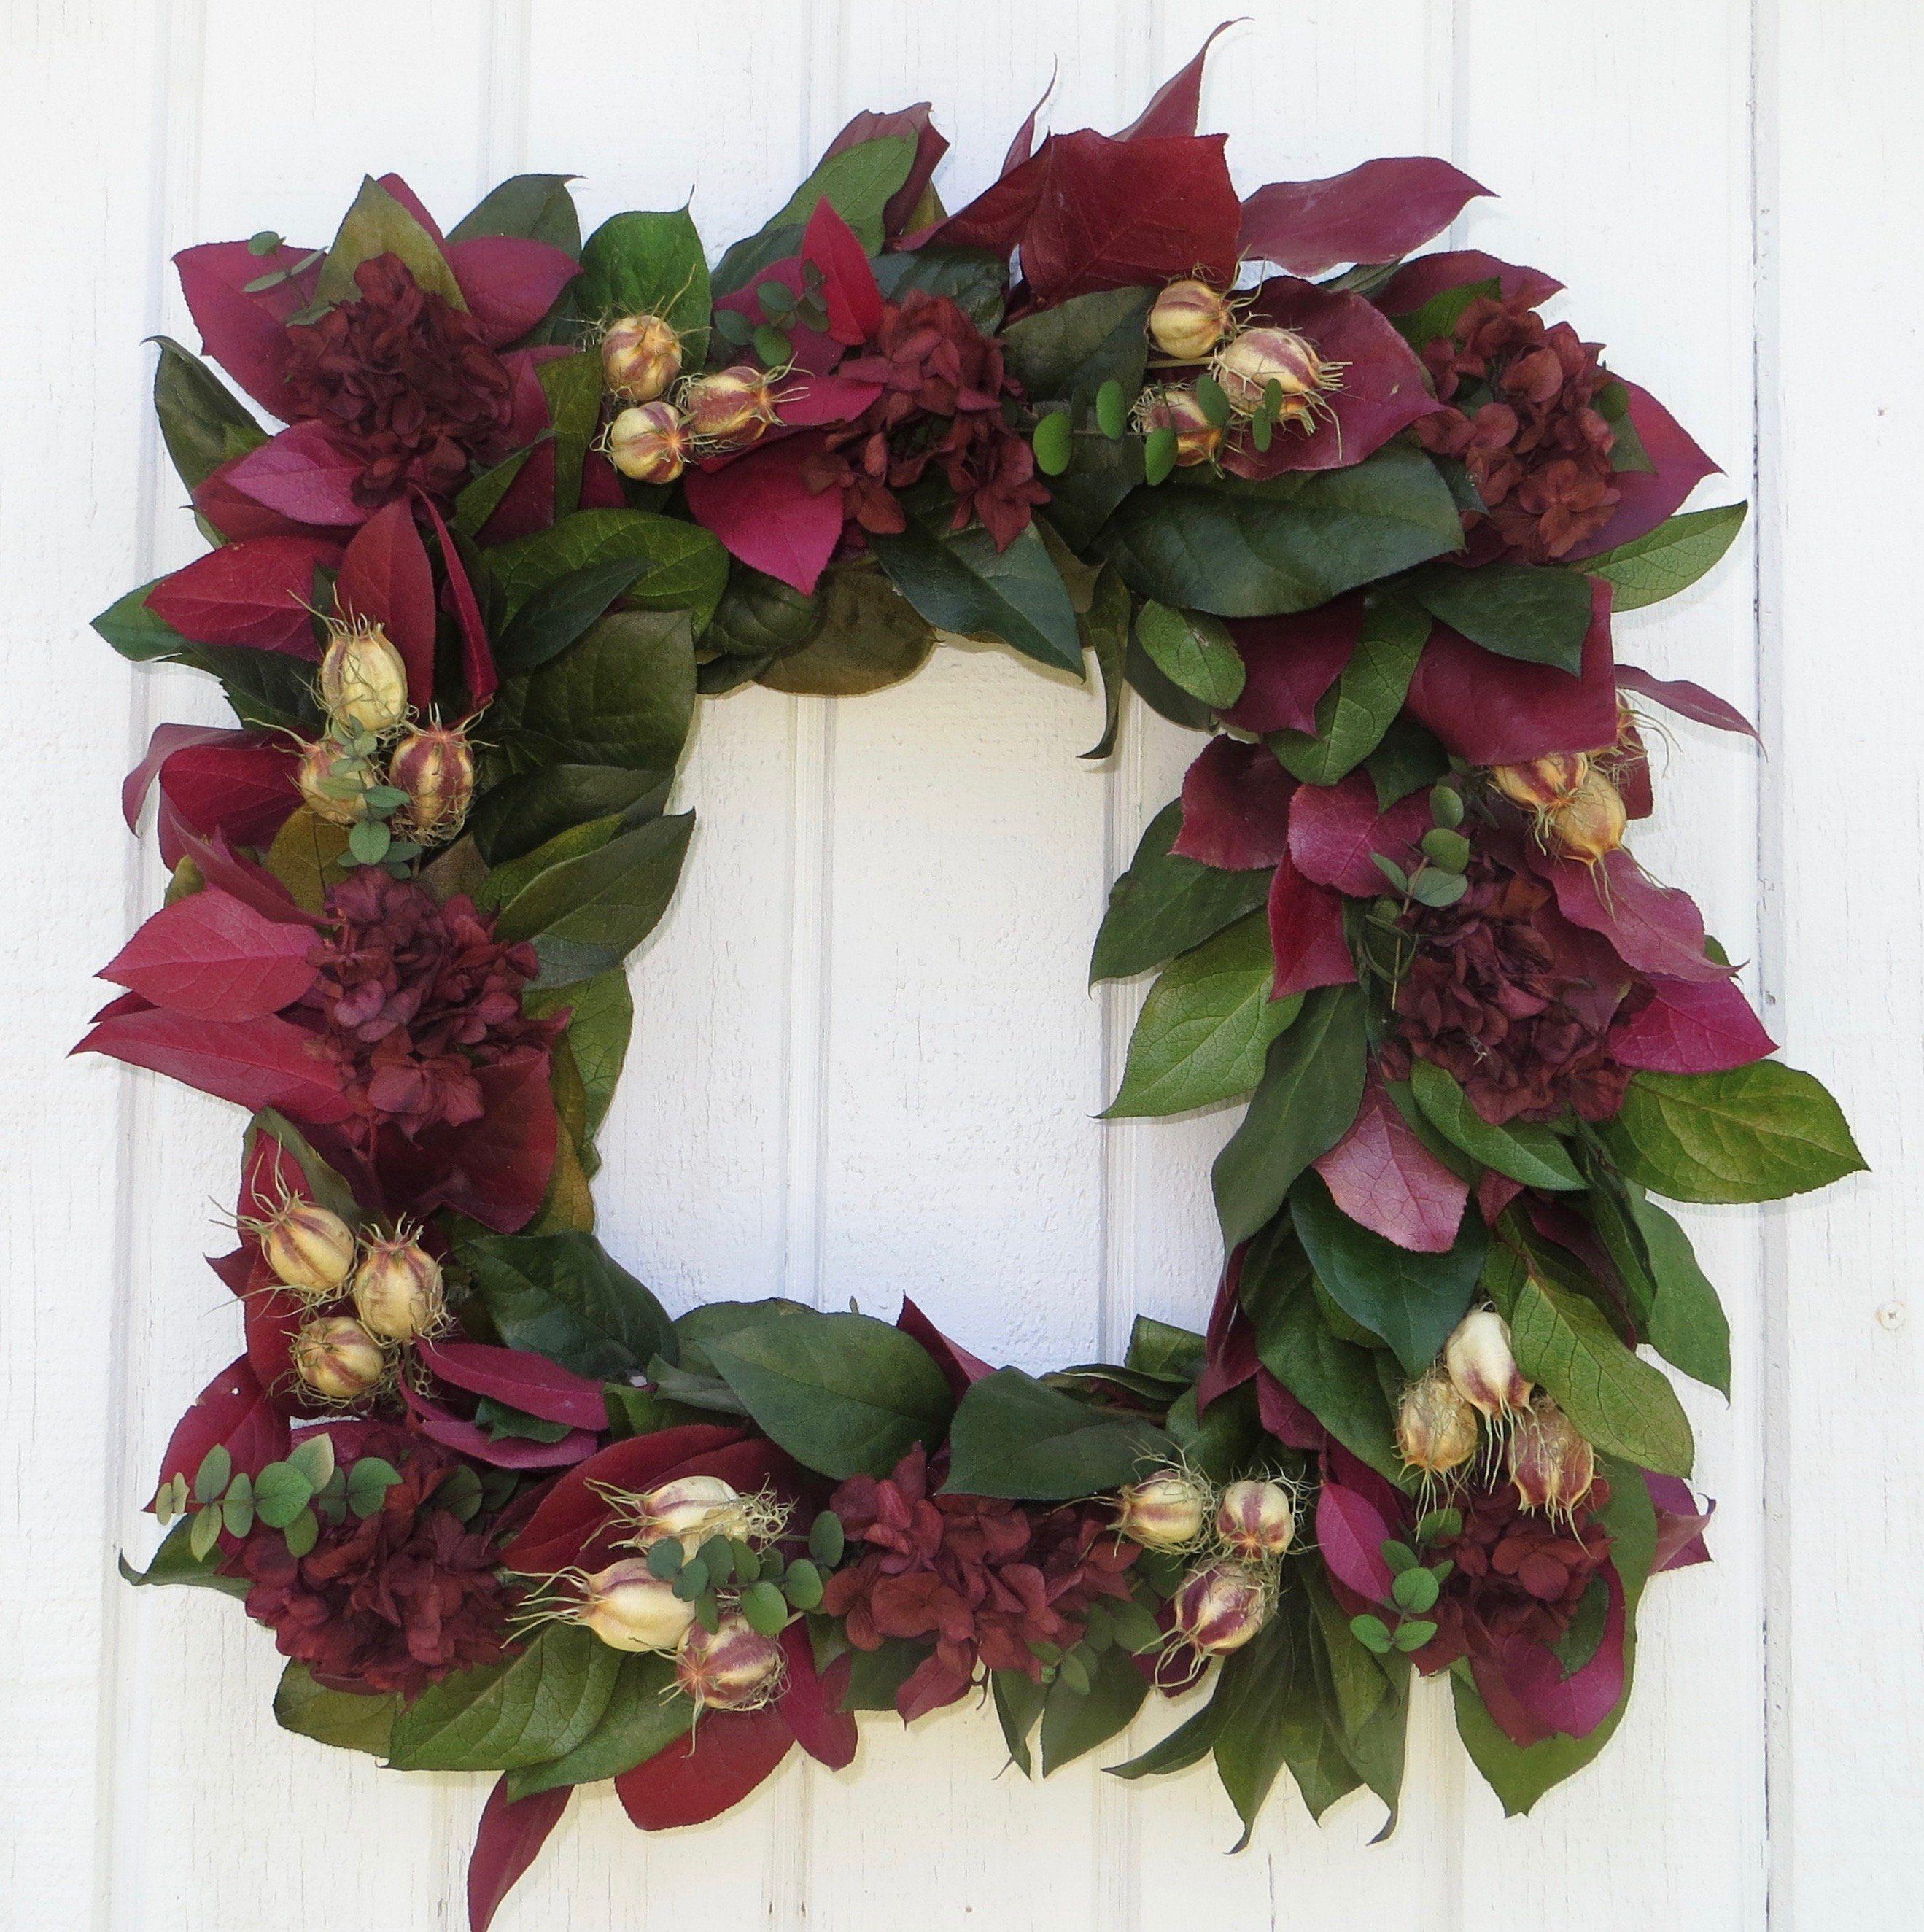 Square Wreath, Dried Flower Wreath, Burgundy And Green Wreath, Dried